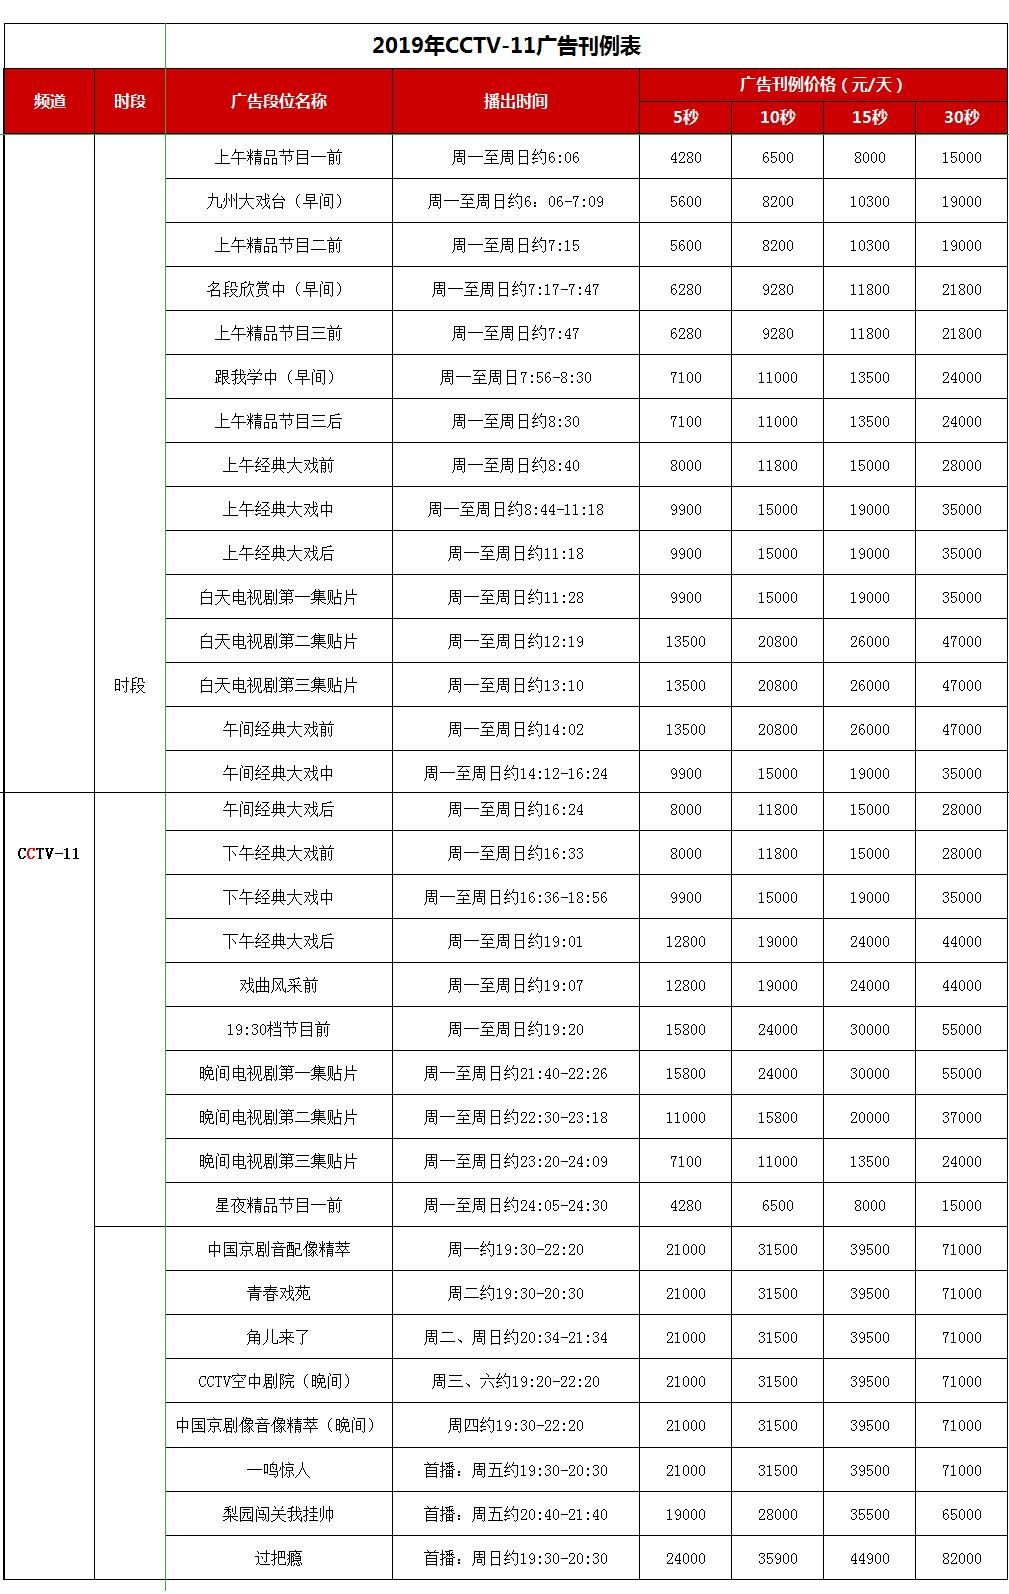 CCTV-11戏曲频道 2019年广告刊例价格